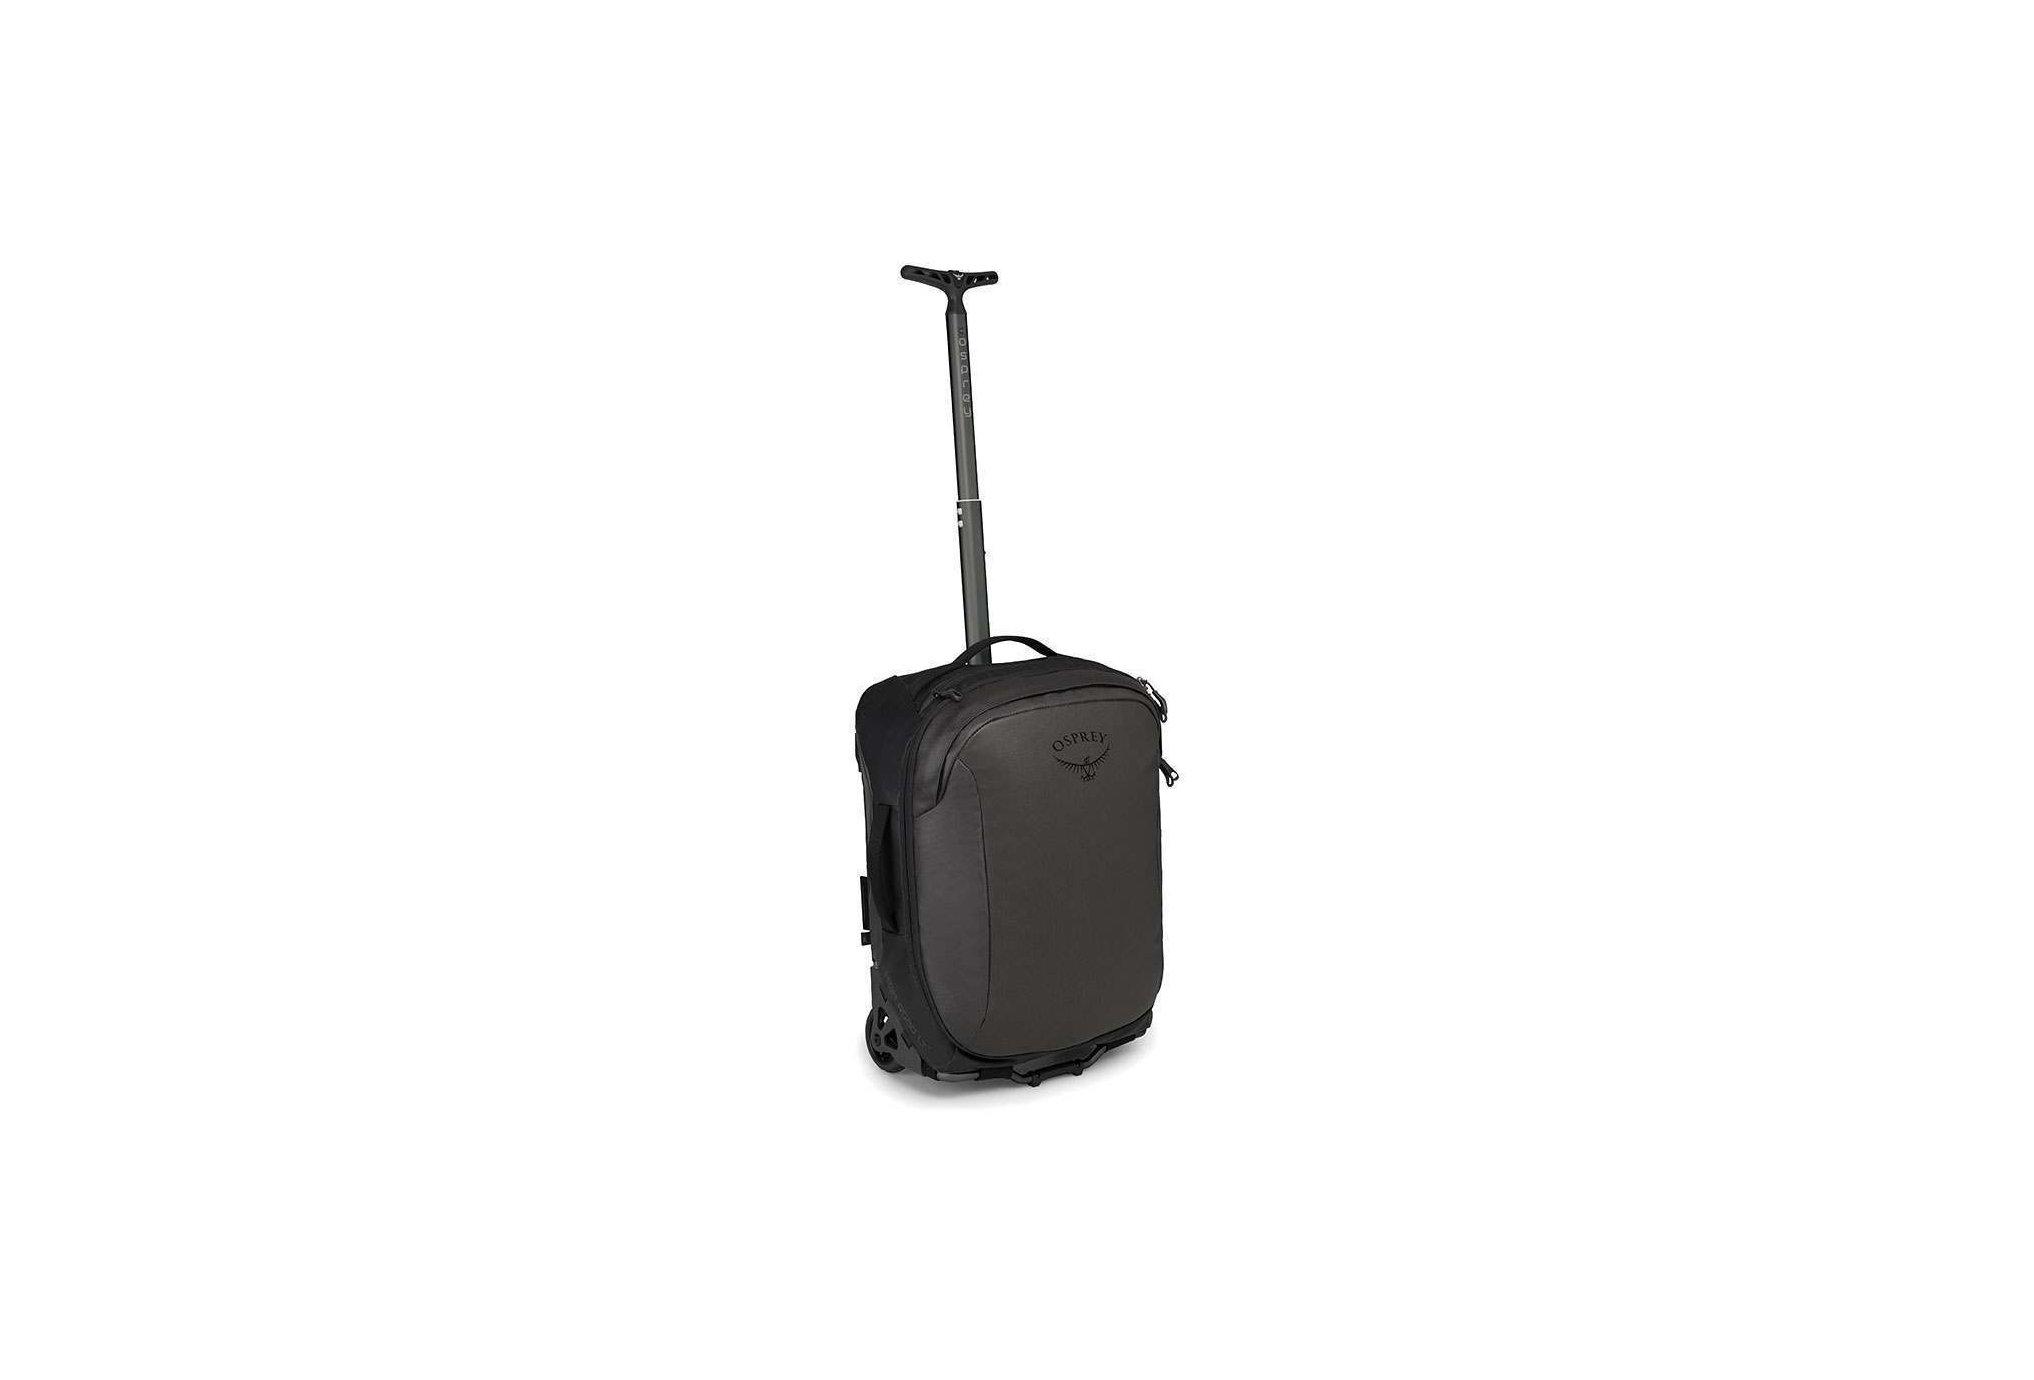 Osprey Rolling Transporter Global Carry-On 30 Diététique Accessoires